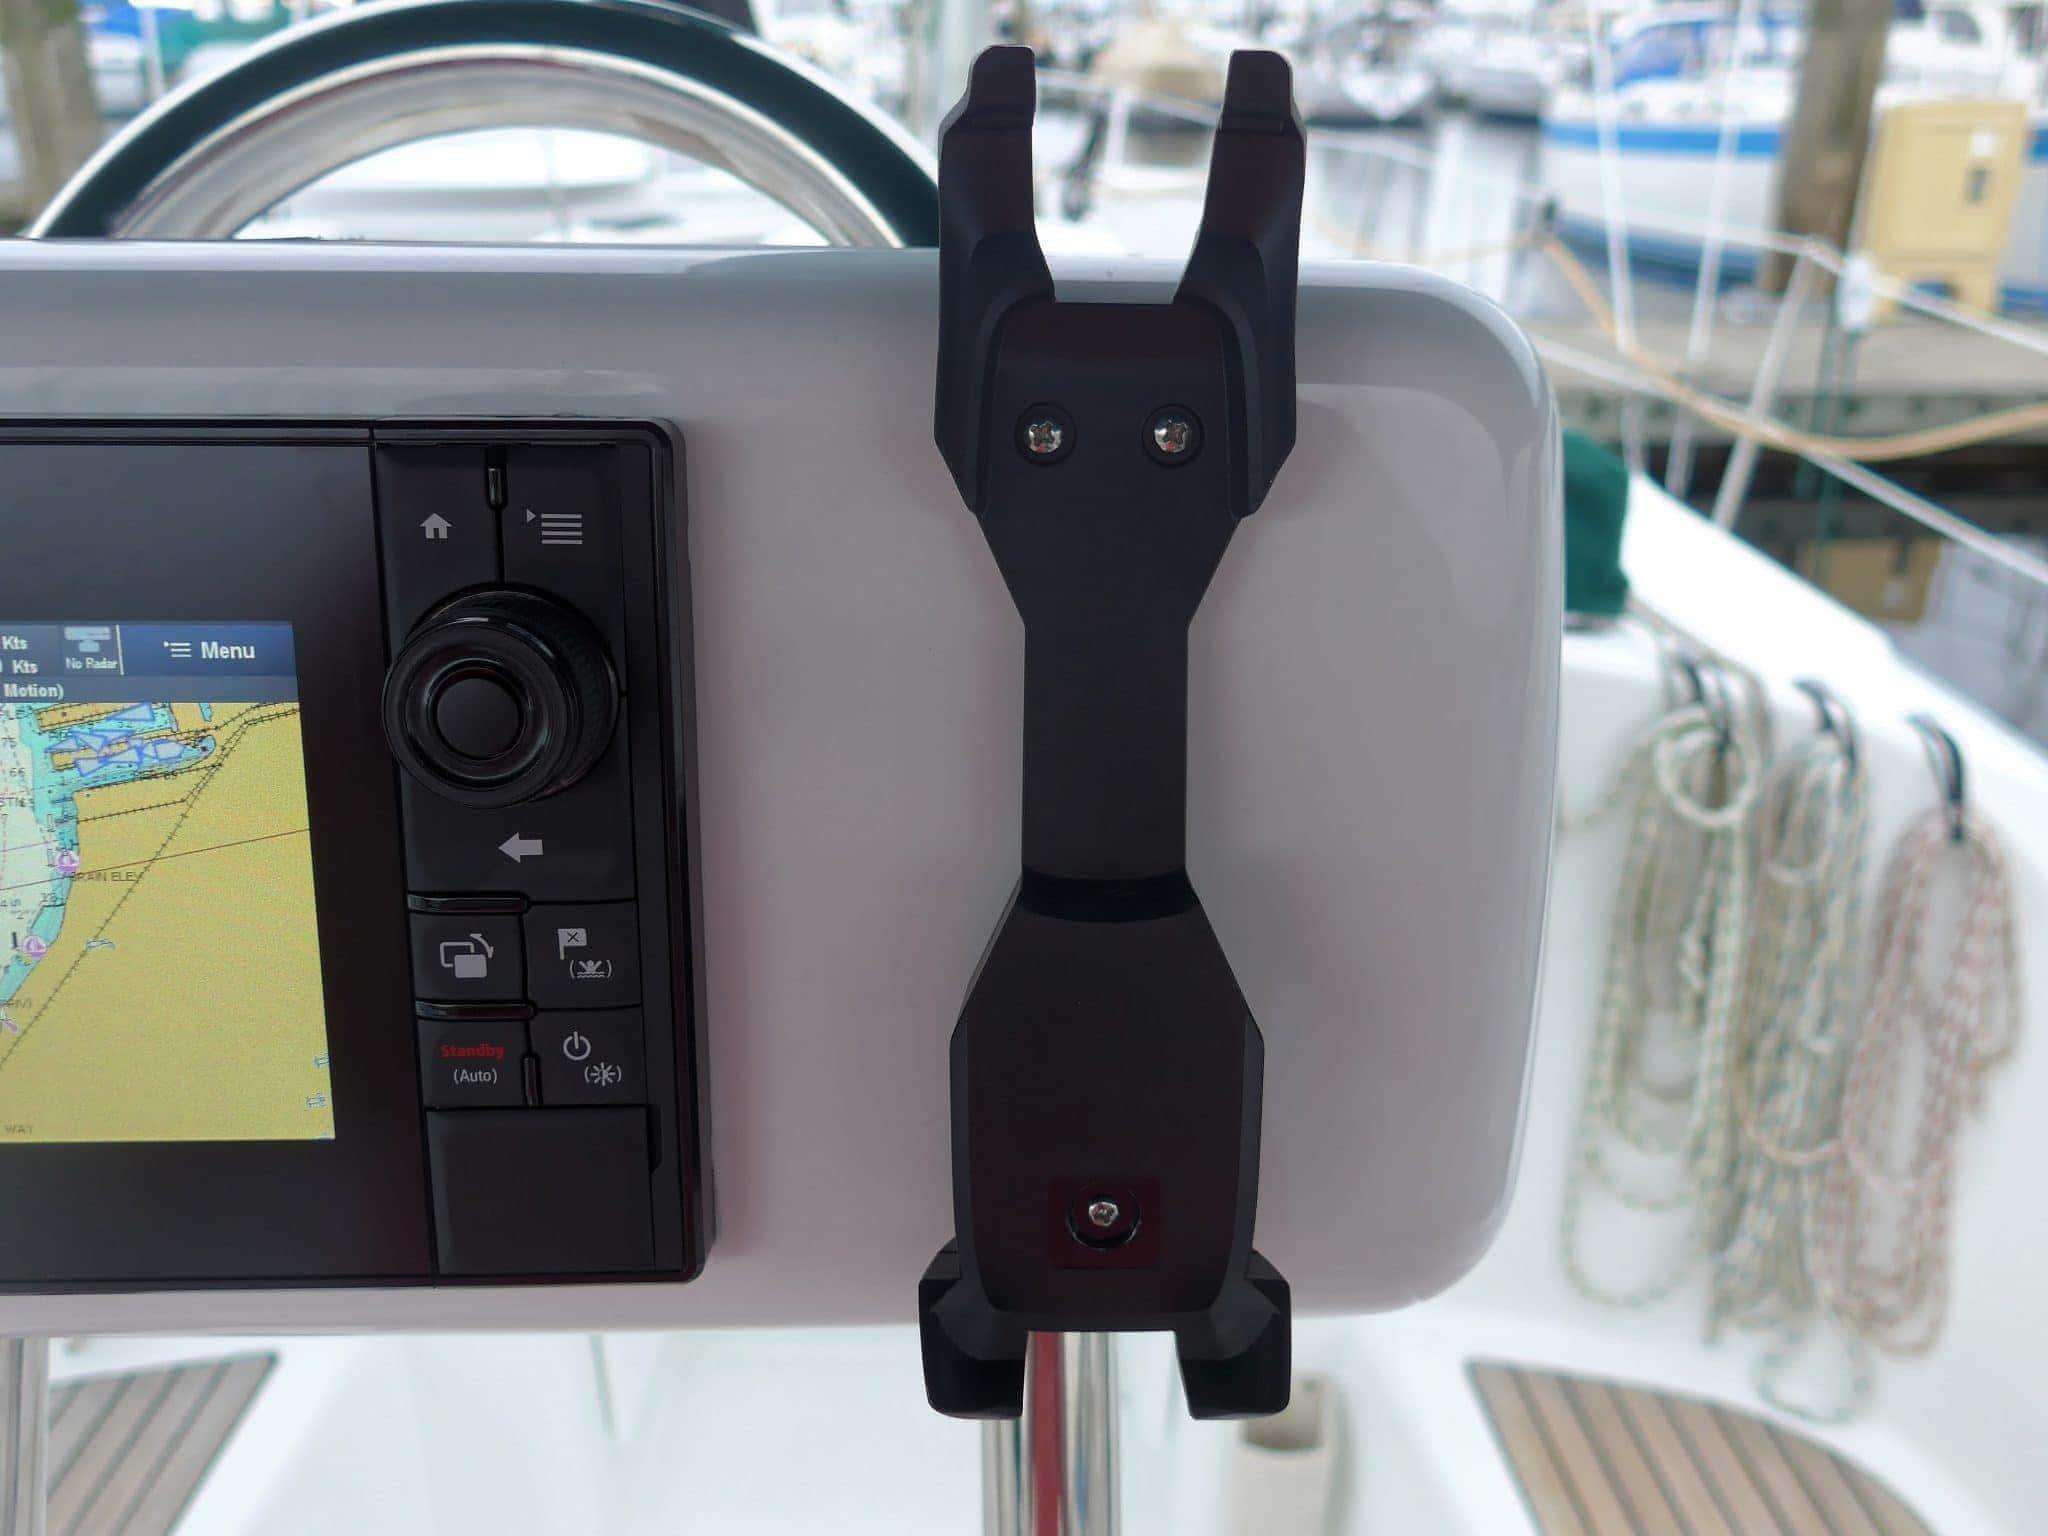 B&G H50 wireless vhf handset charging base